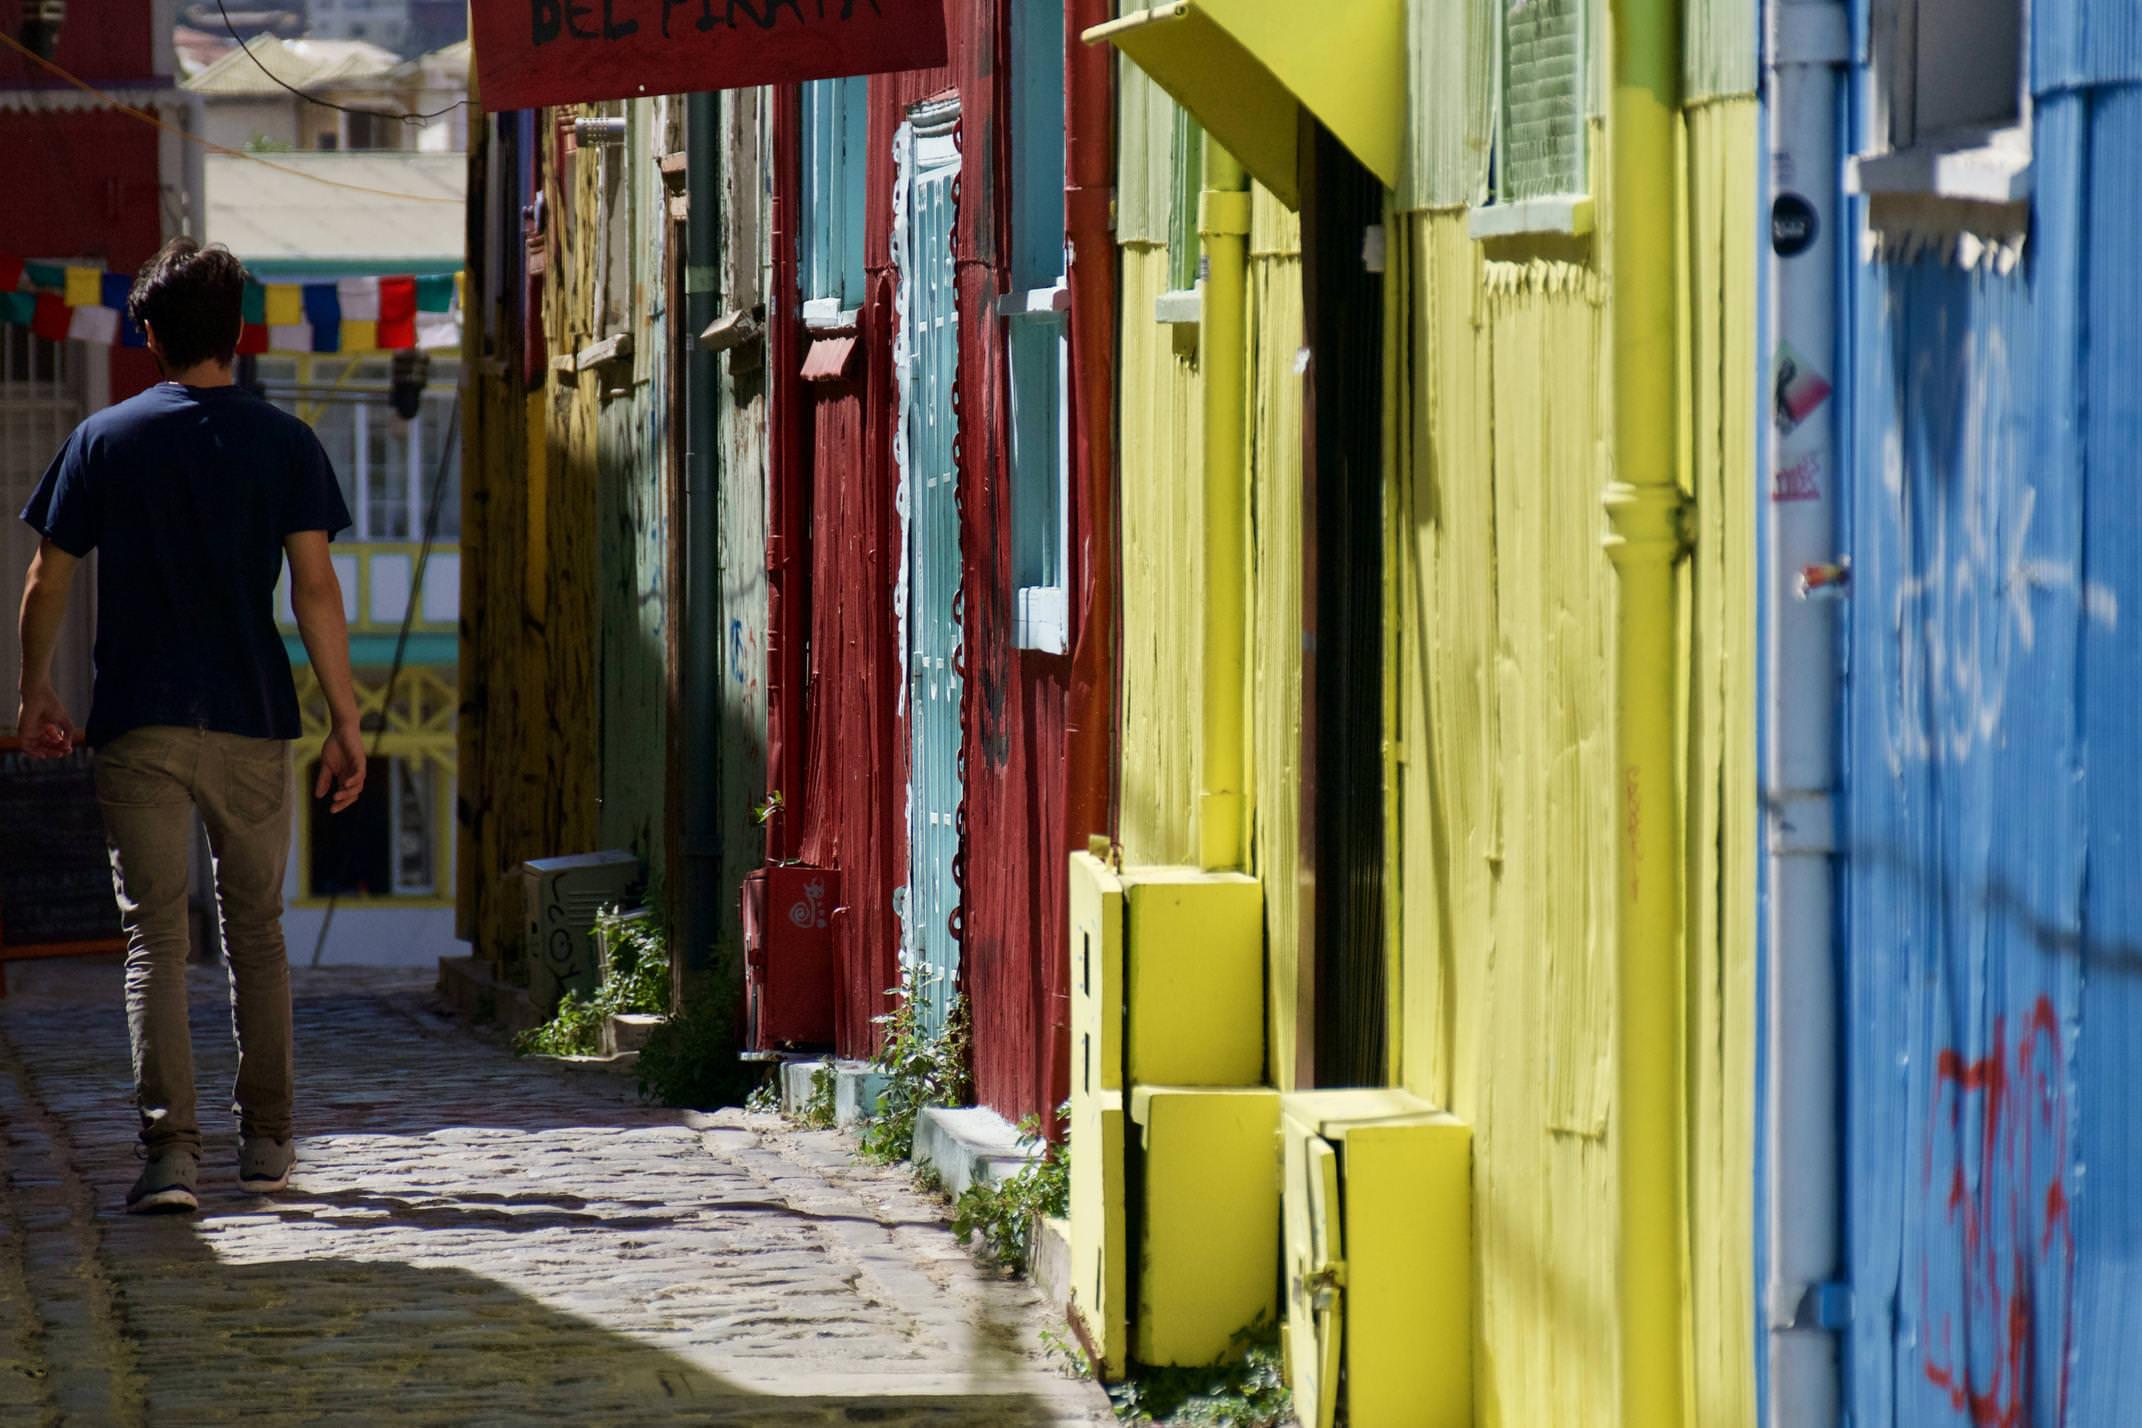 Chile valparaiso colourful street man walking